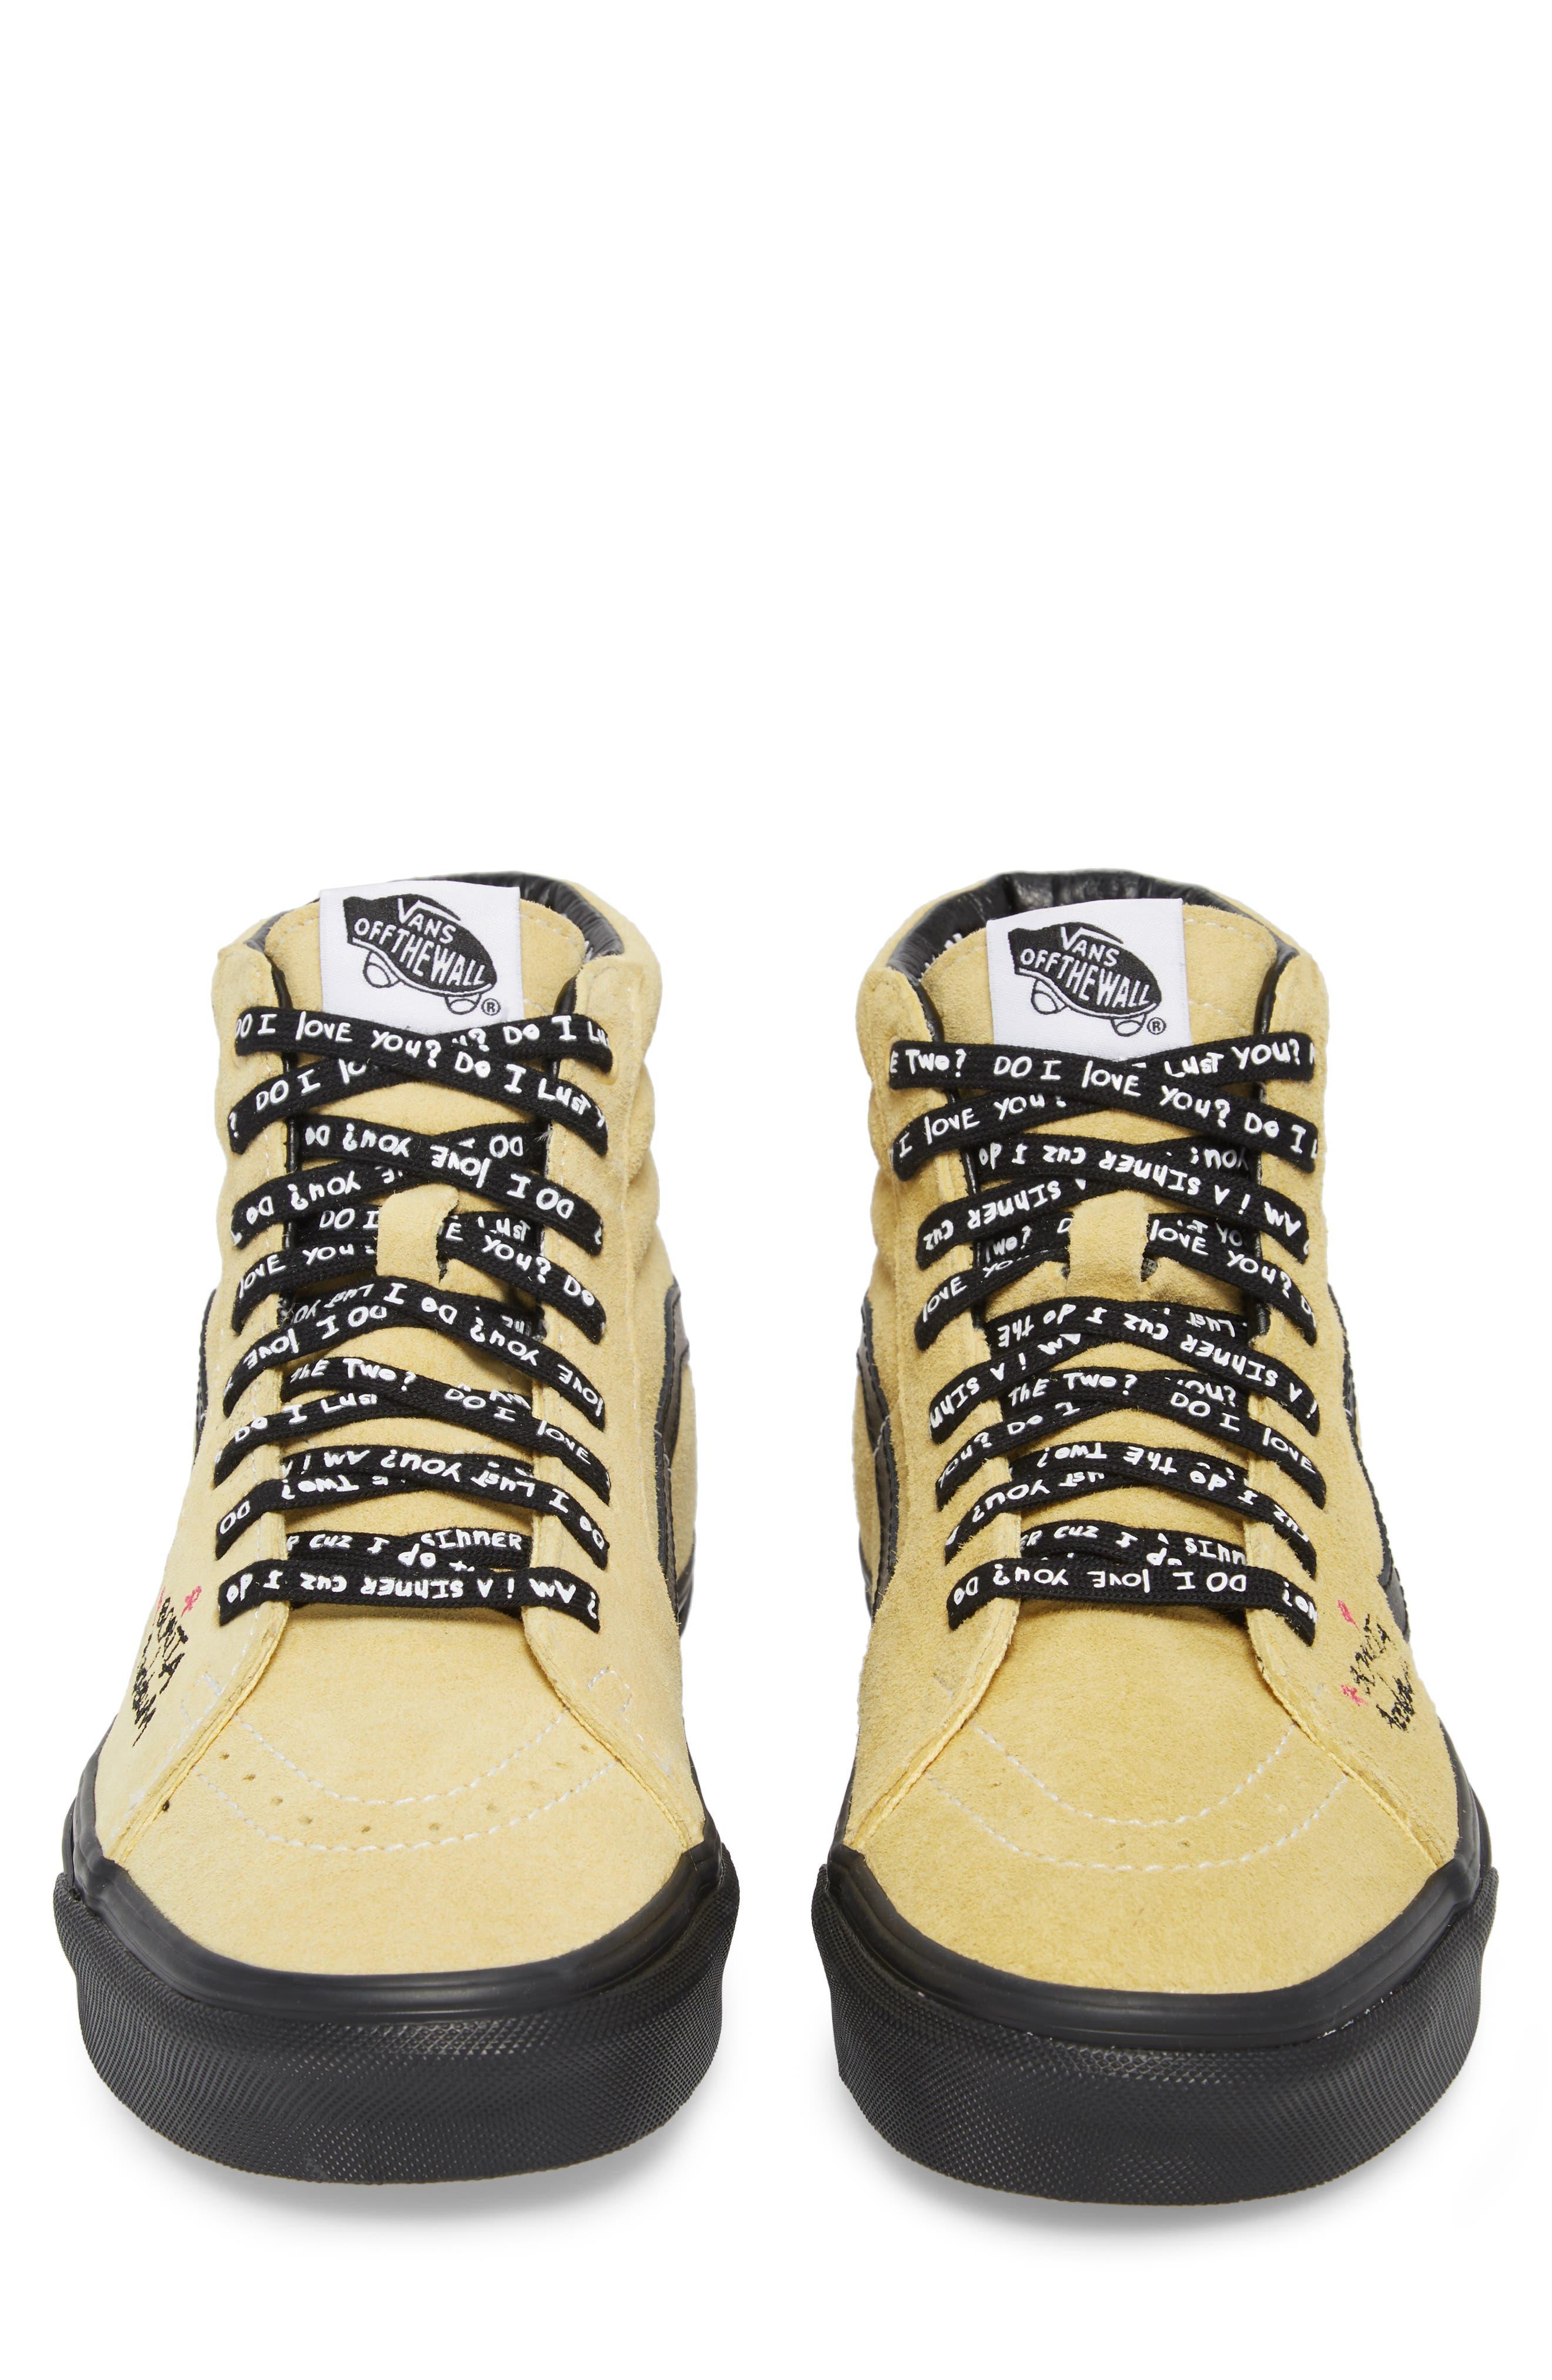 ATCQ Sk8-Hi Sneaker,                             Alternate thumbnail 5, color,                             720